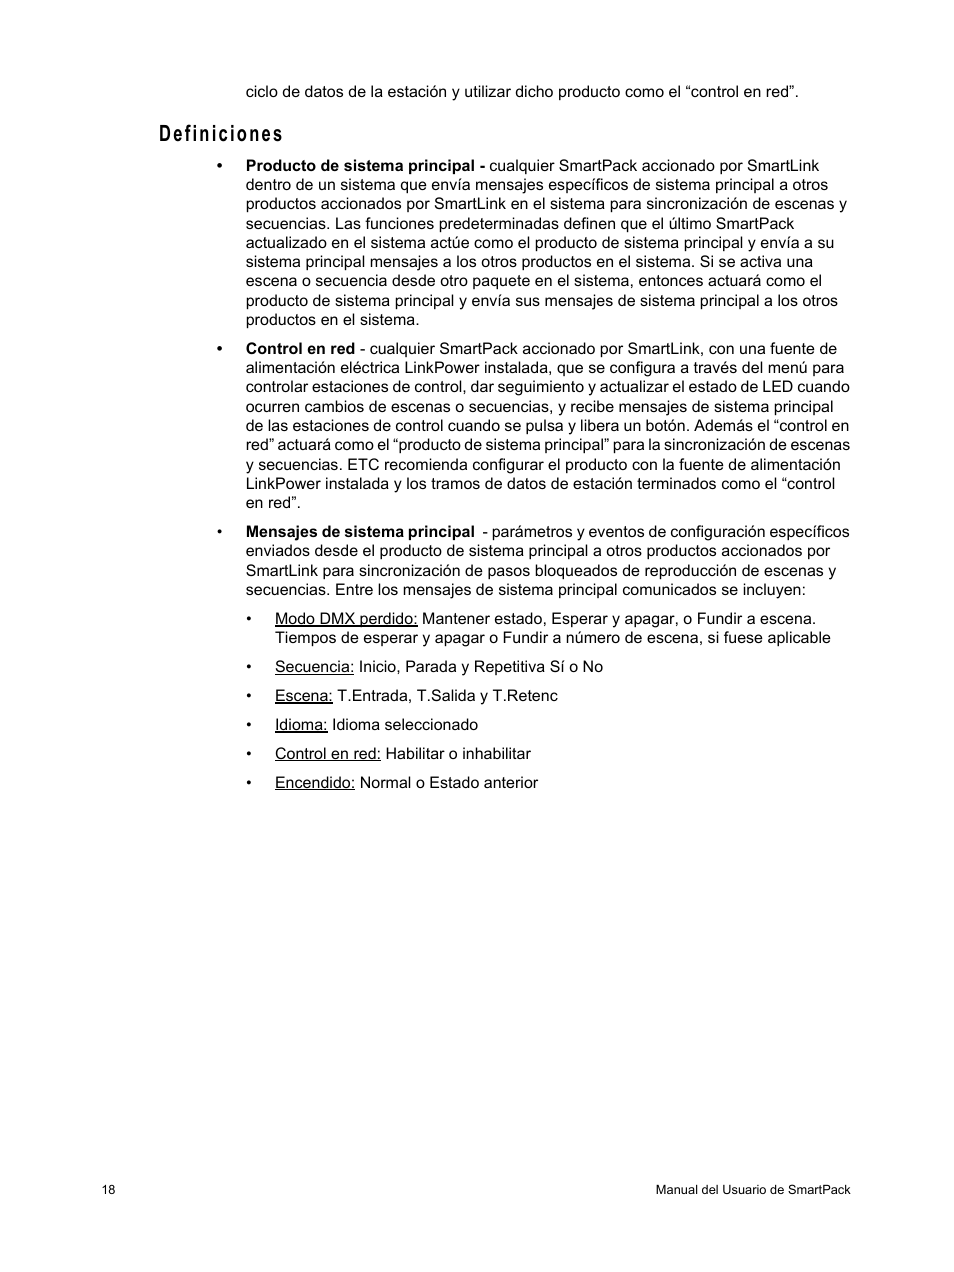 Definiciones | ETC SmartPack v2 0 Manual del usuario